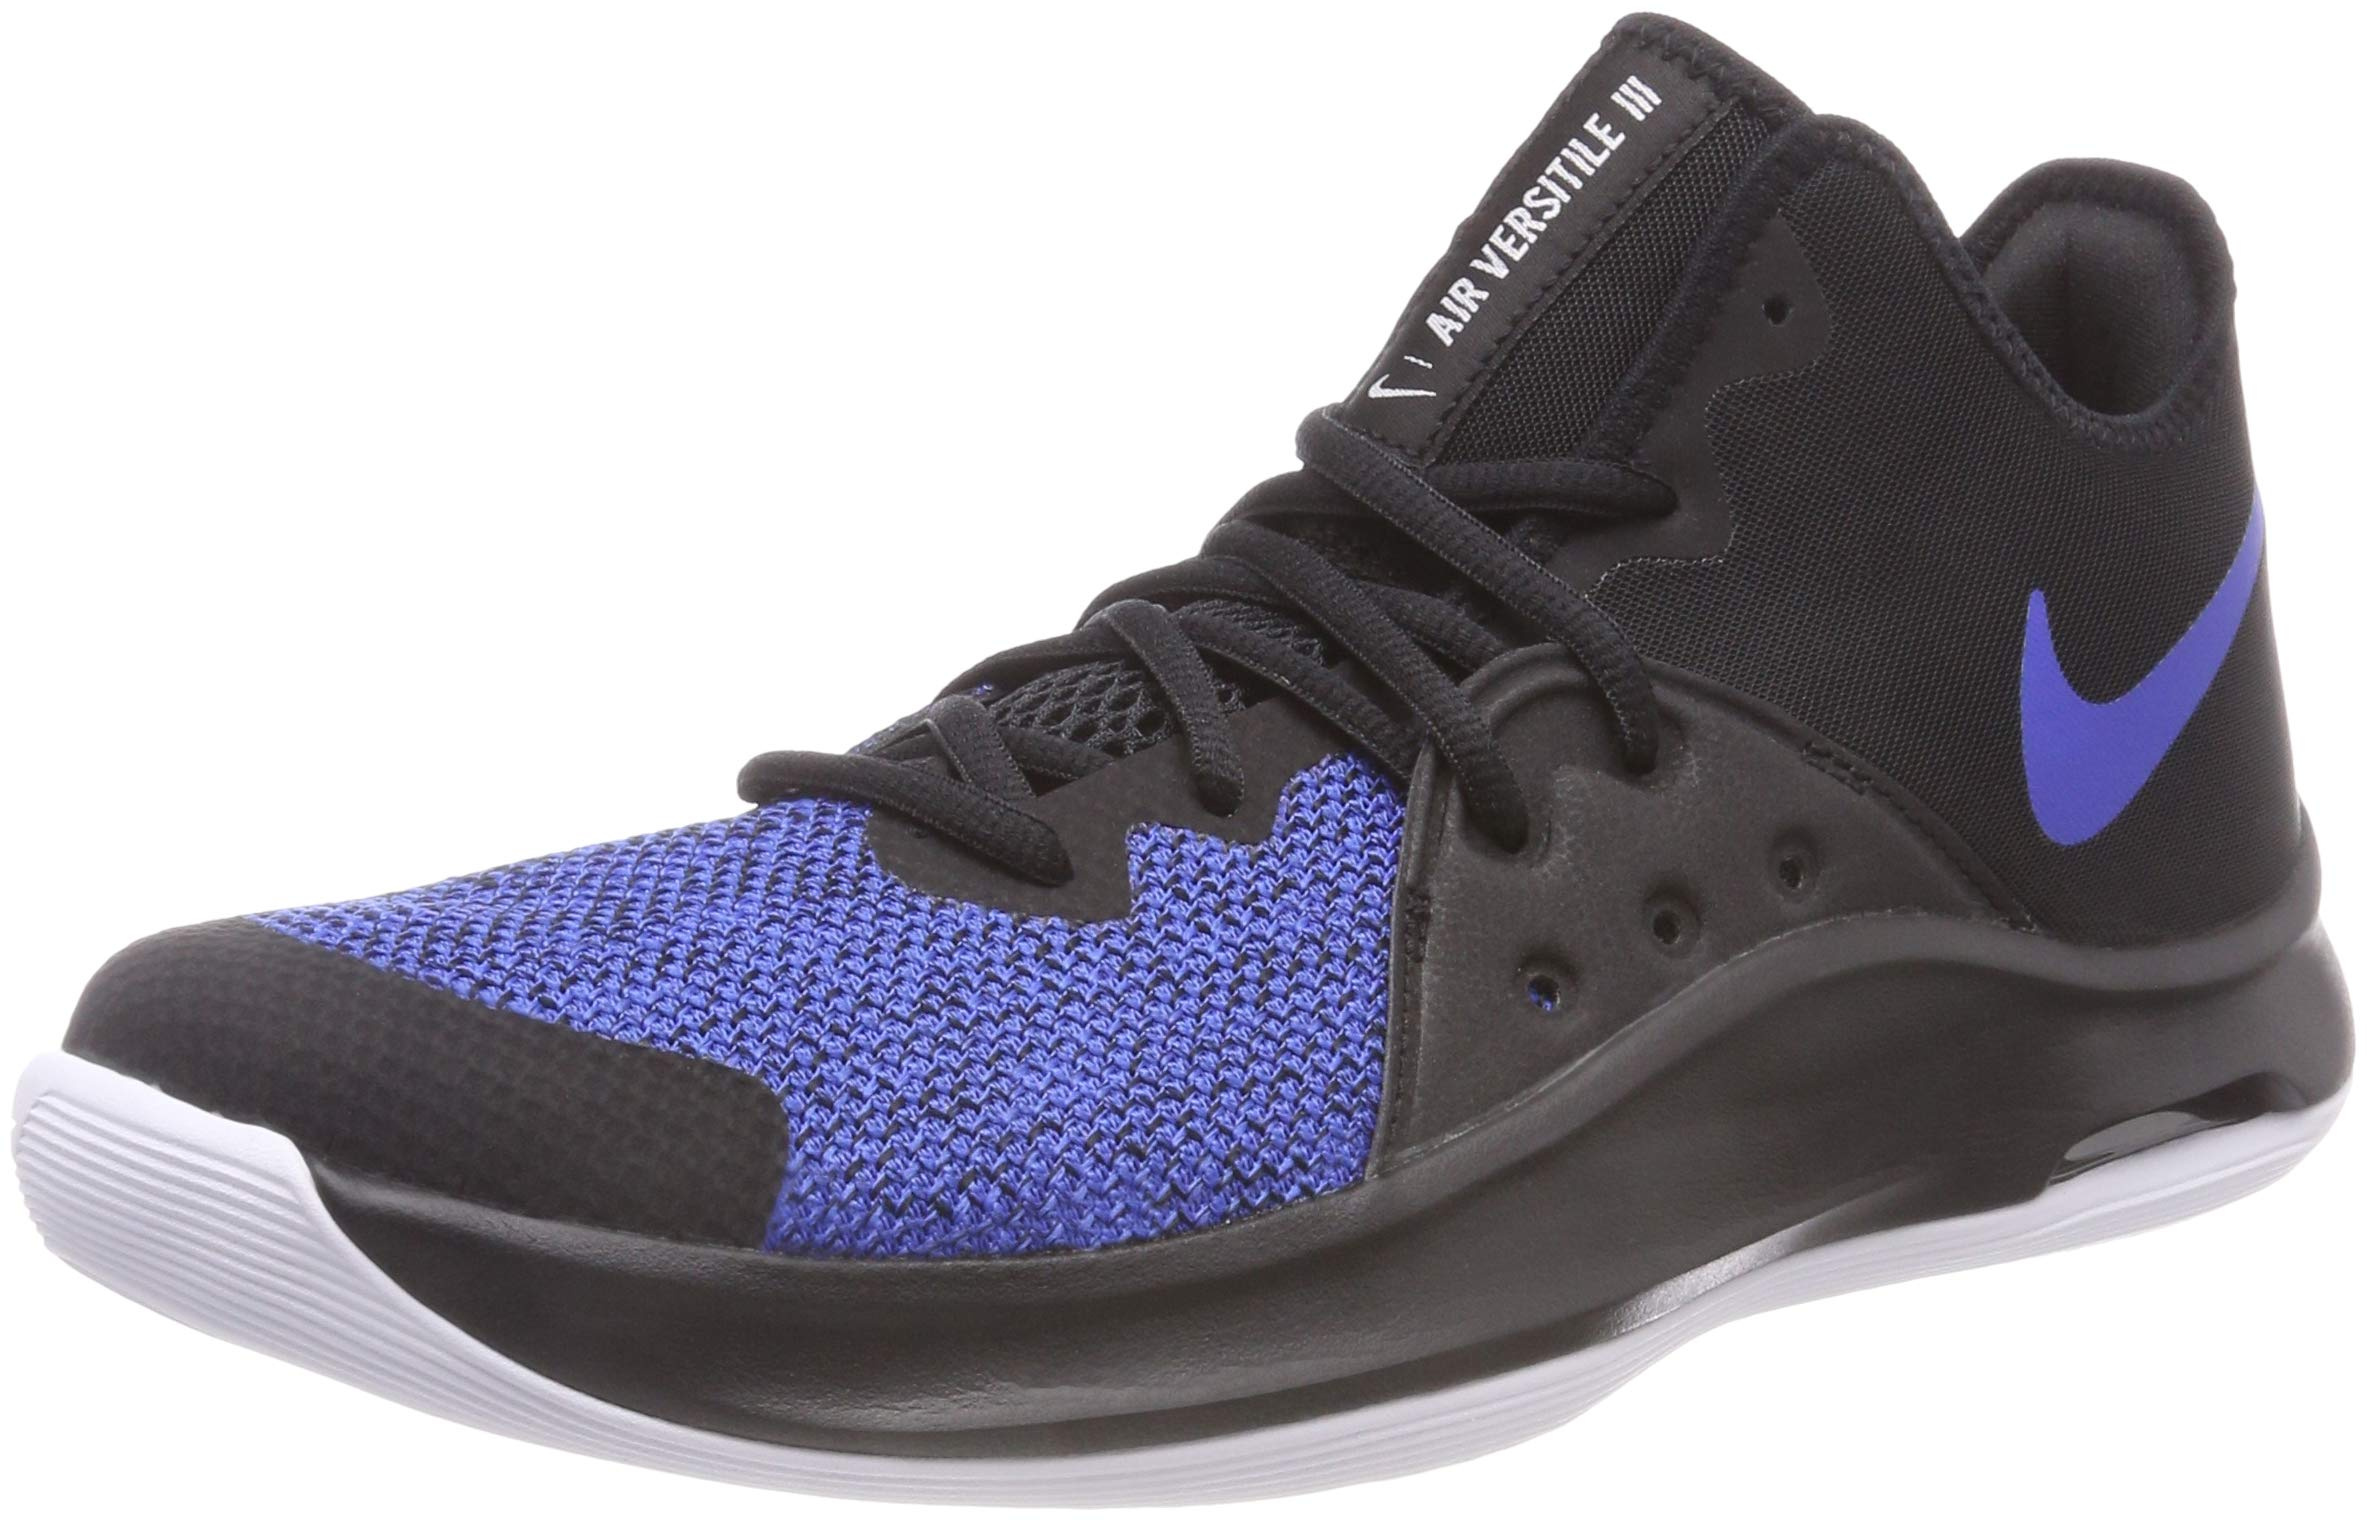 Nike Air Versitile III Men's Basketball